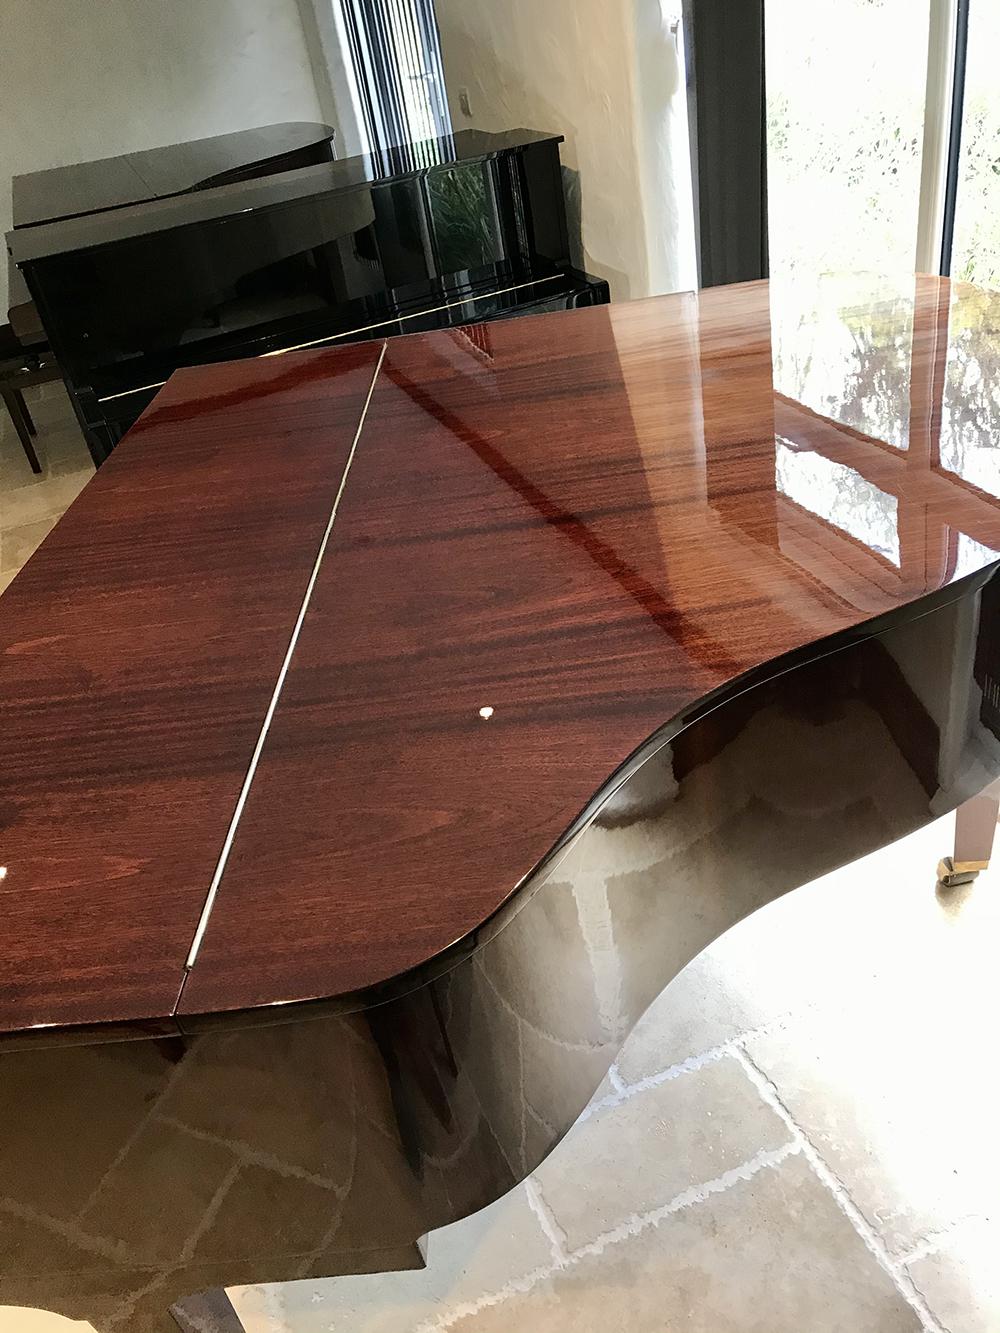 used-petrof-baby-grand-Piano-Dorset-for-sale-14.jpg